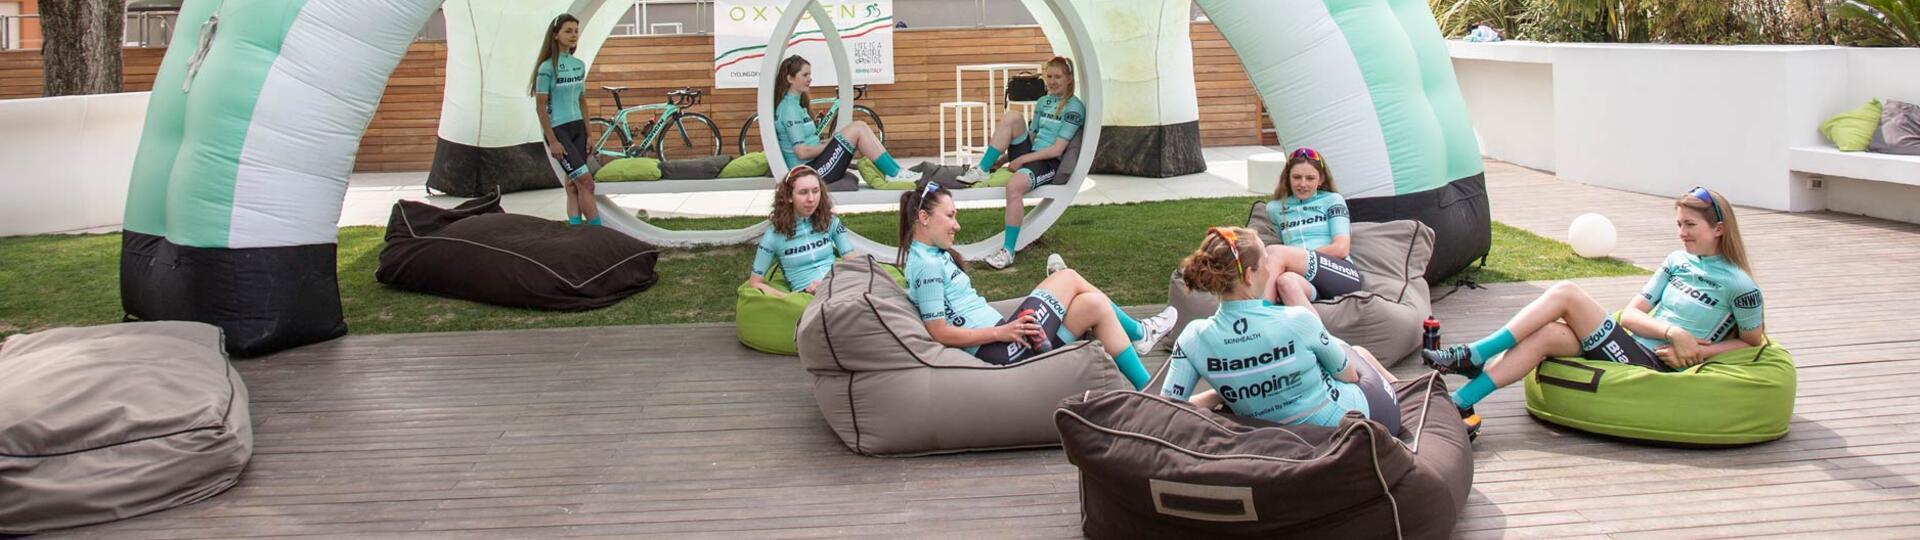 cycling.oxygenhotel de radfahren-geschichte-traditionen-im-hotel-in-rimini 014